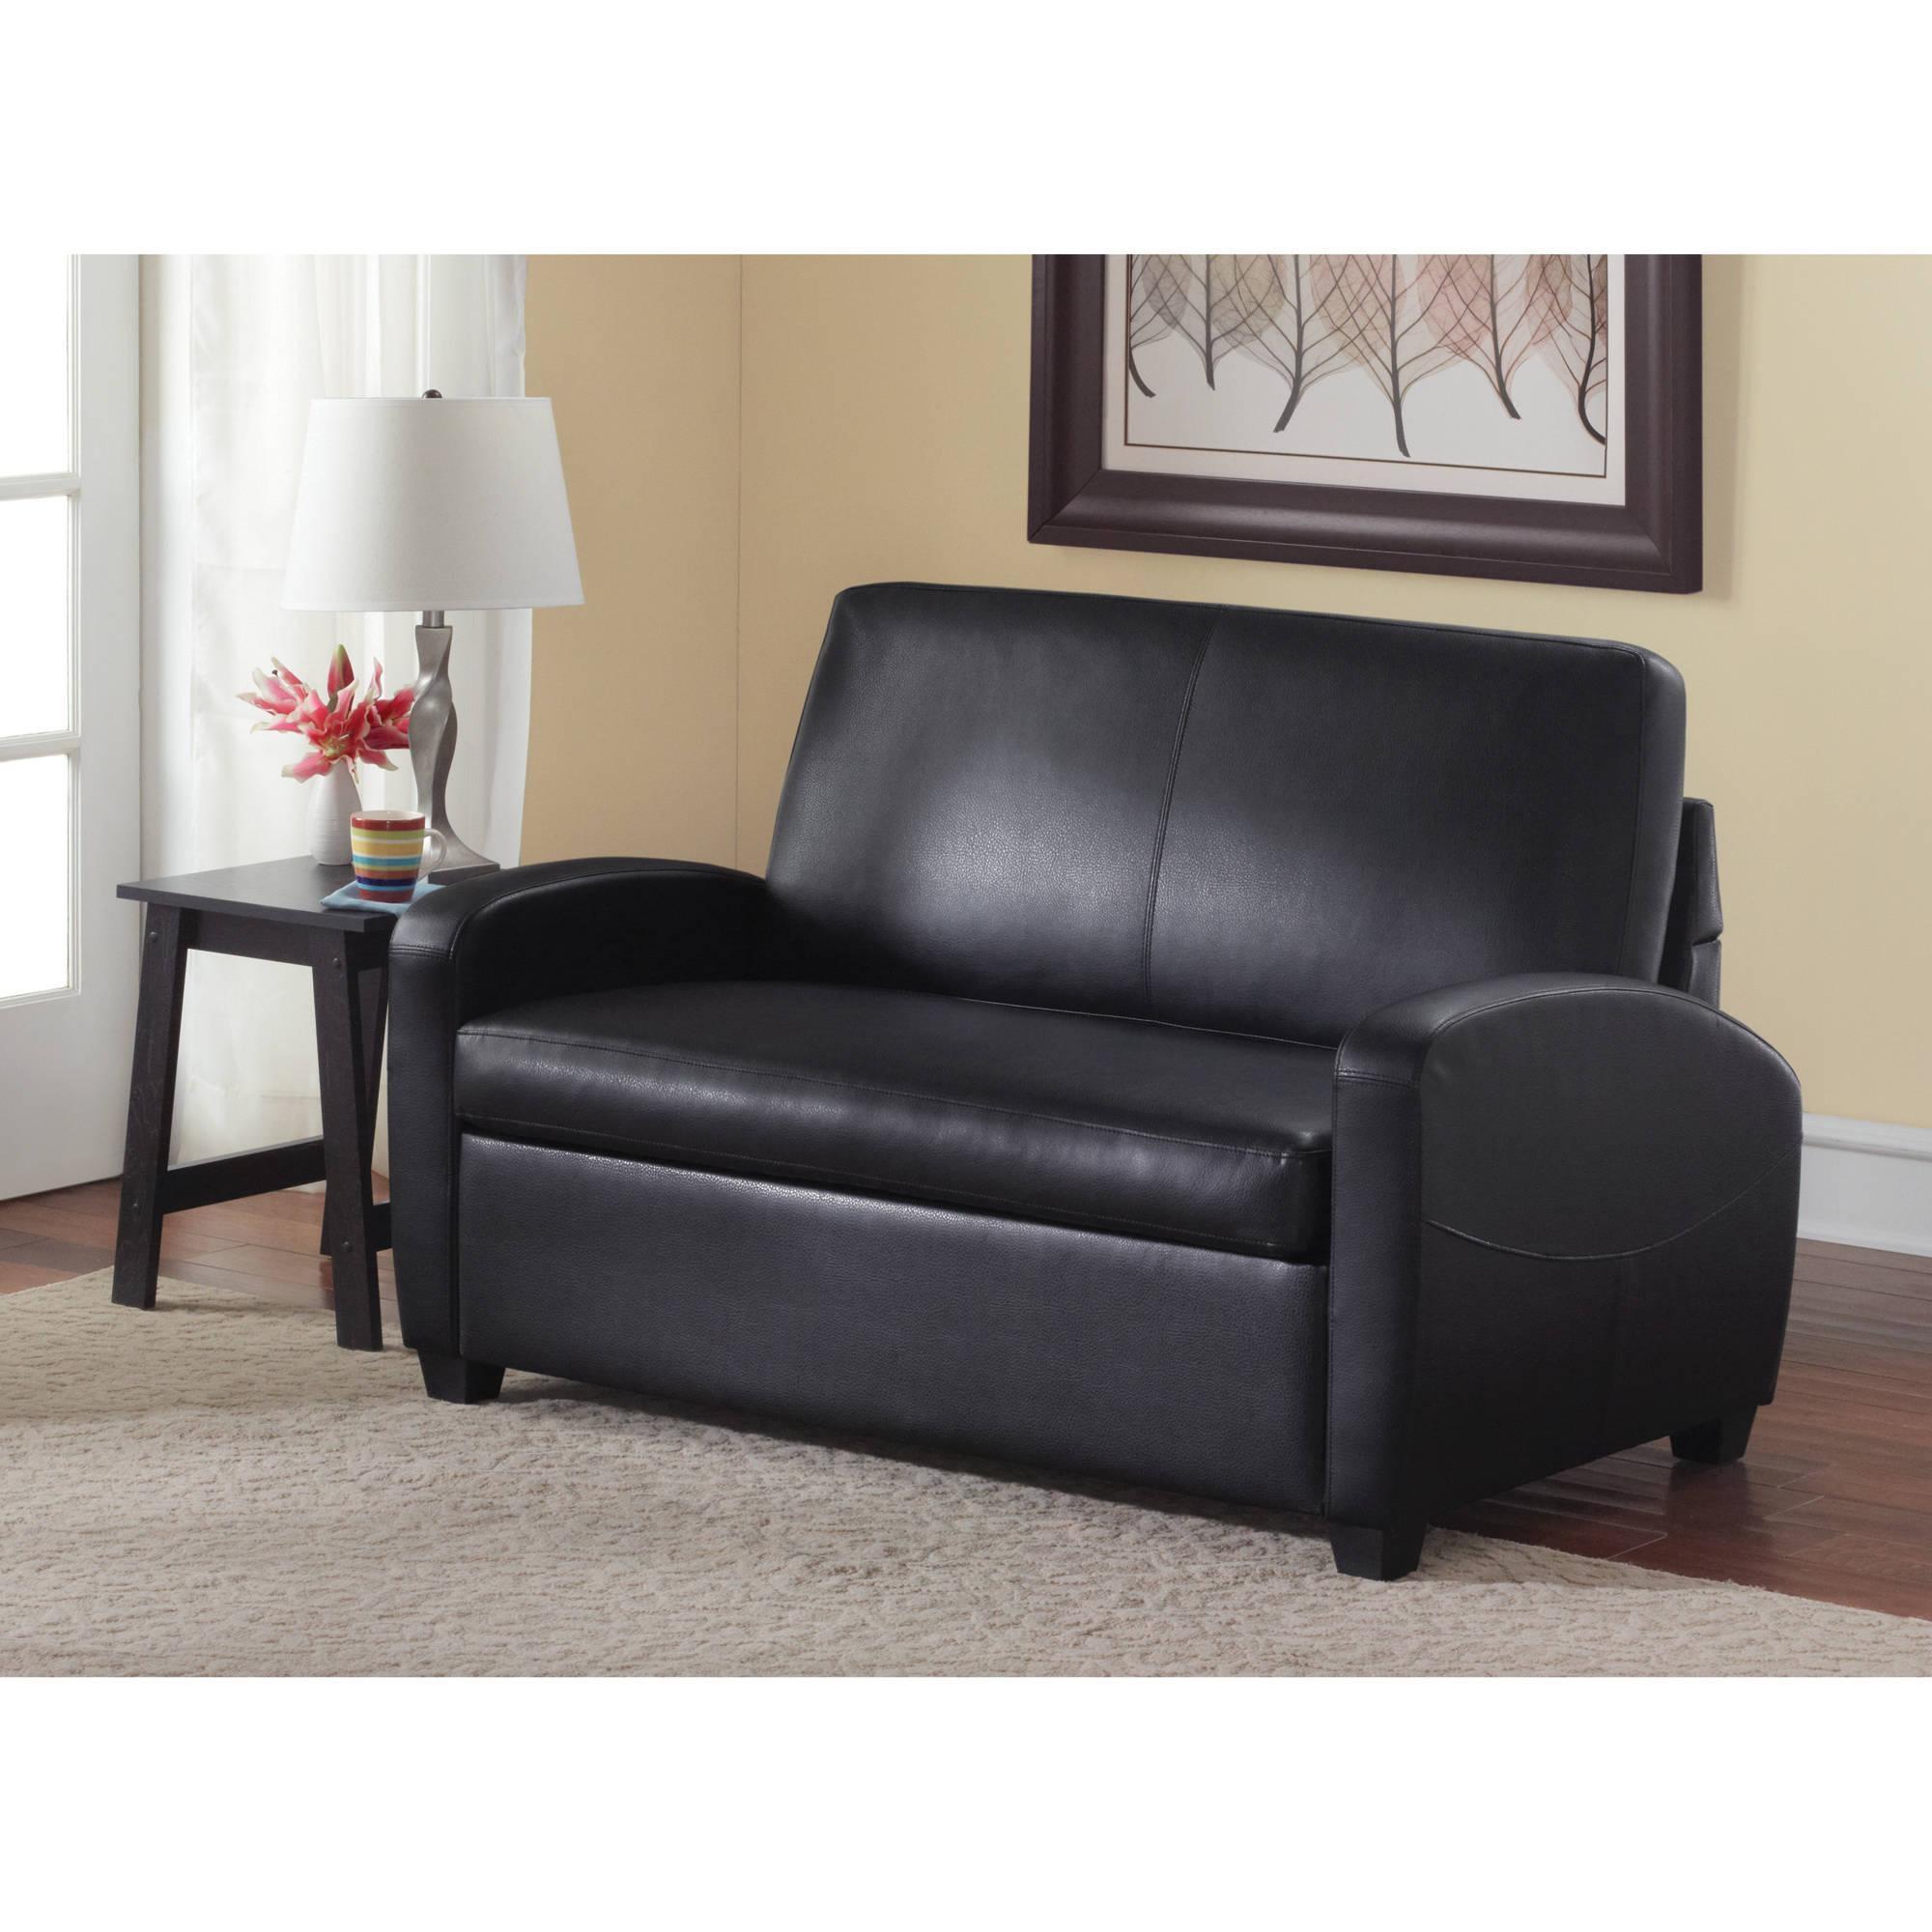 walmart black sofa covers sure fit slipcover amazon 20 top wallmart ideas